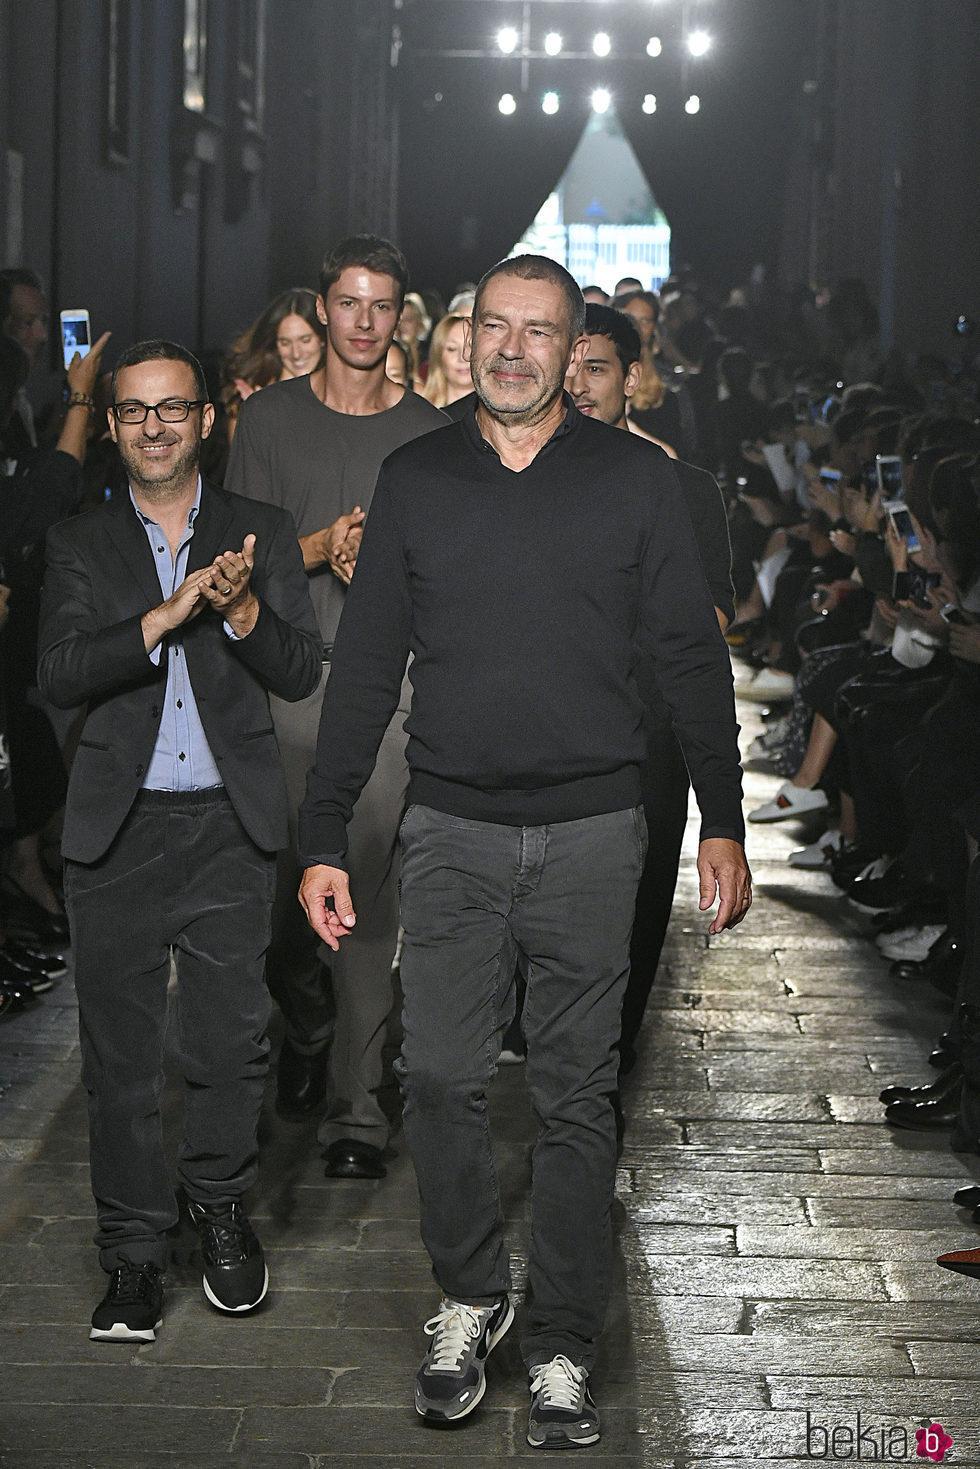 Tomas Maier en el desfile de Bottega Veneta de la Milán Fashion Week primavera/verano 2017